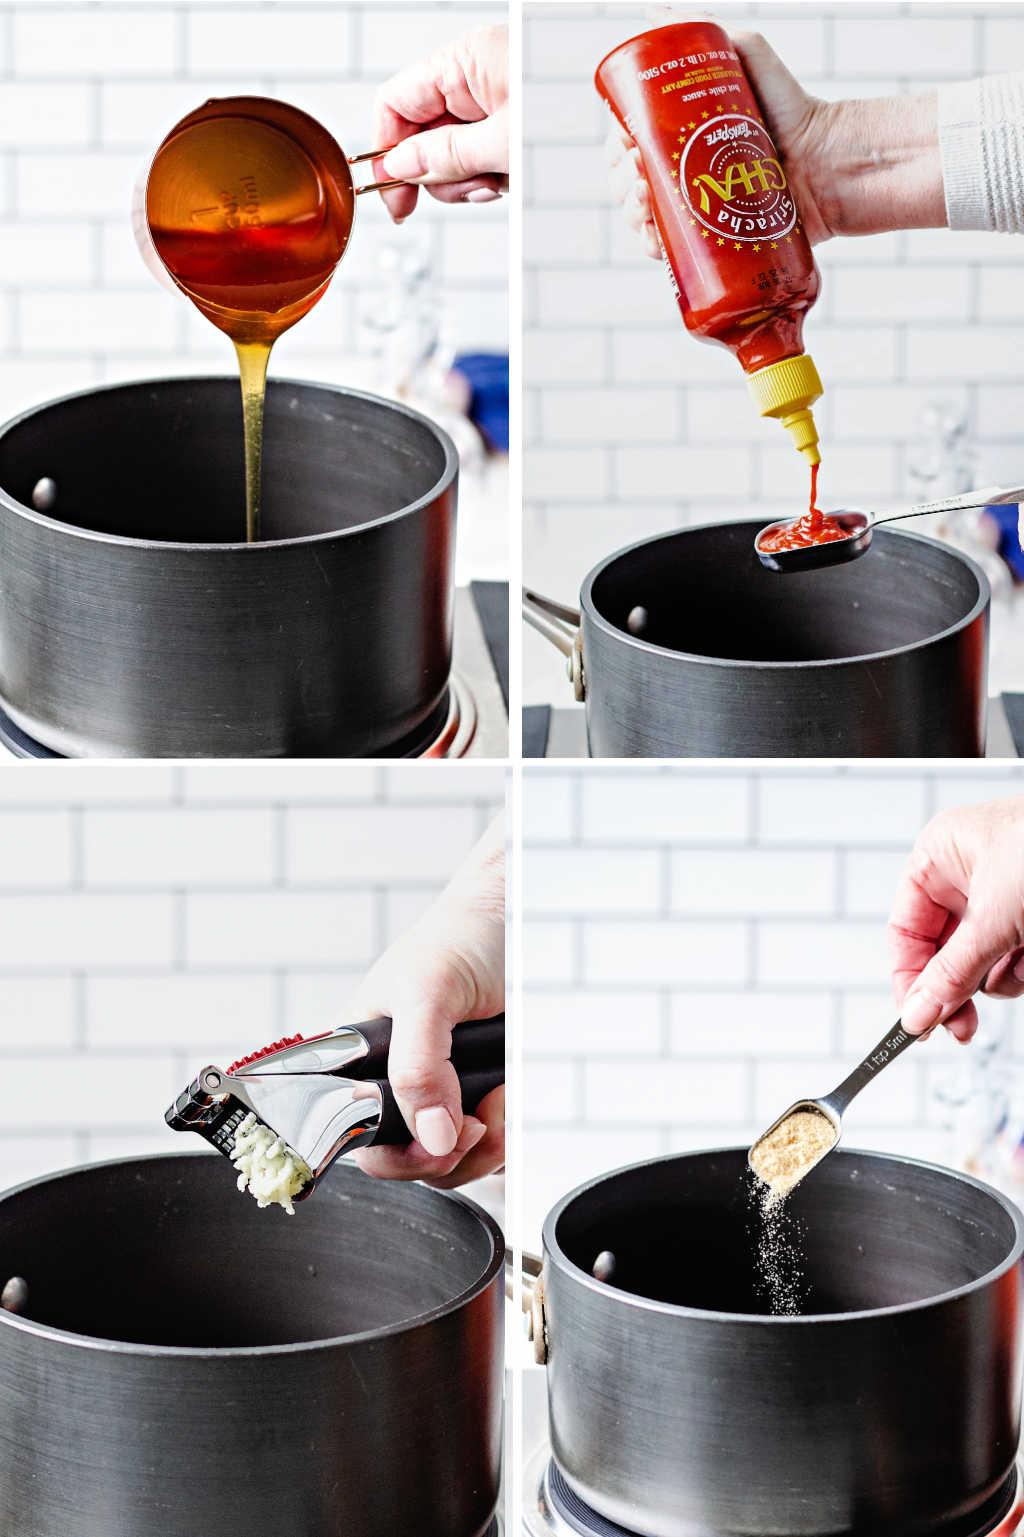 process steps for making honey sriracha saucee.